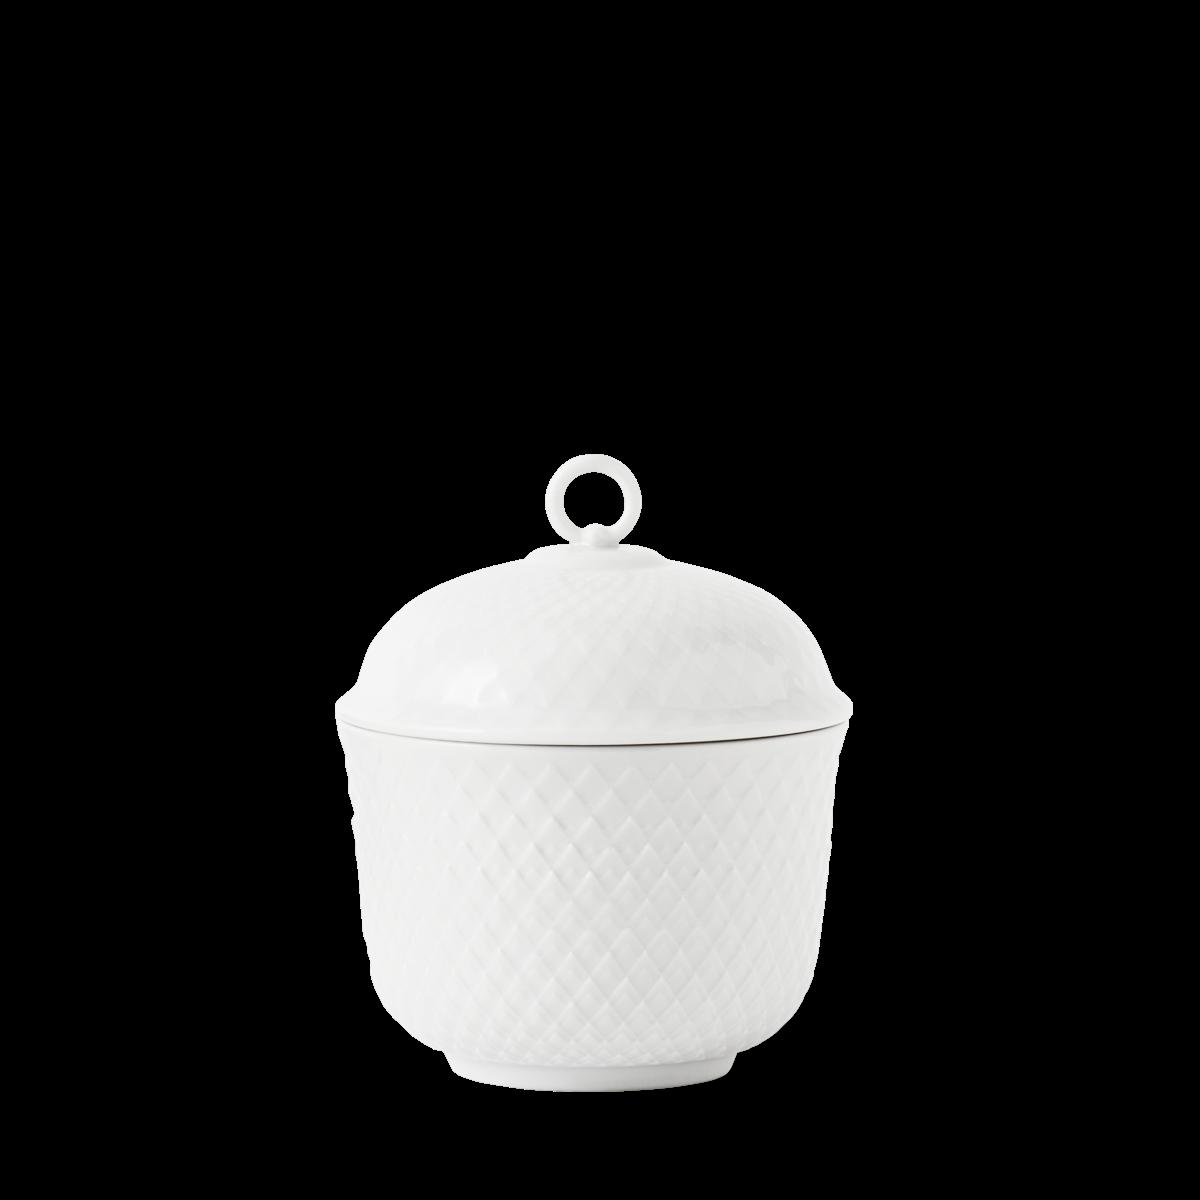 clip transparent download White Handmade Porcelain Rhombe Sugar Bowl